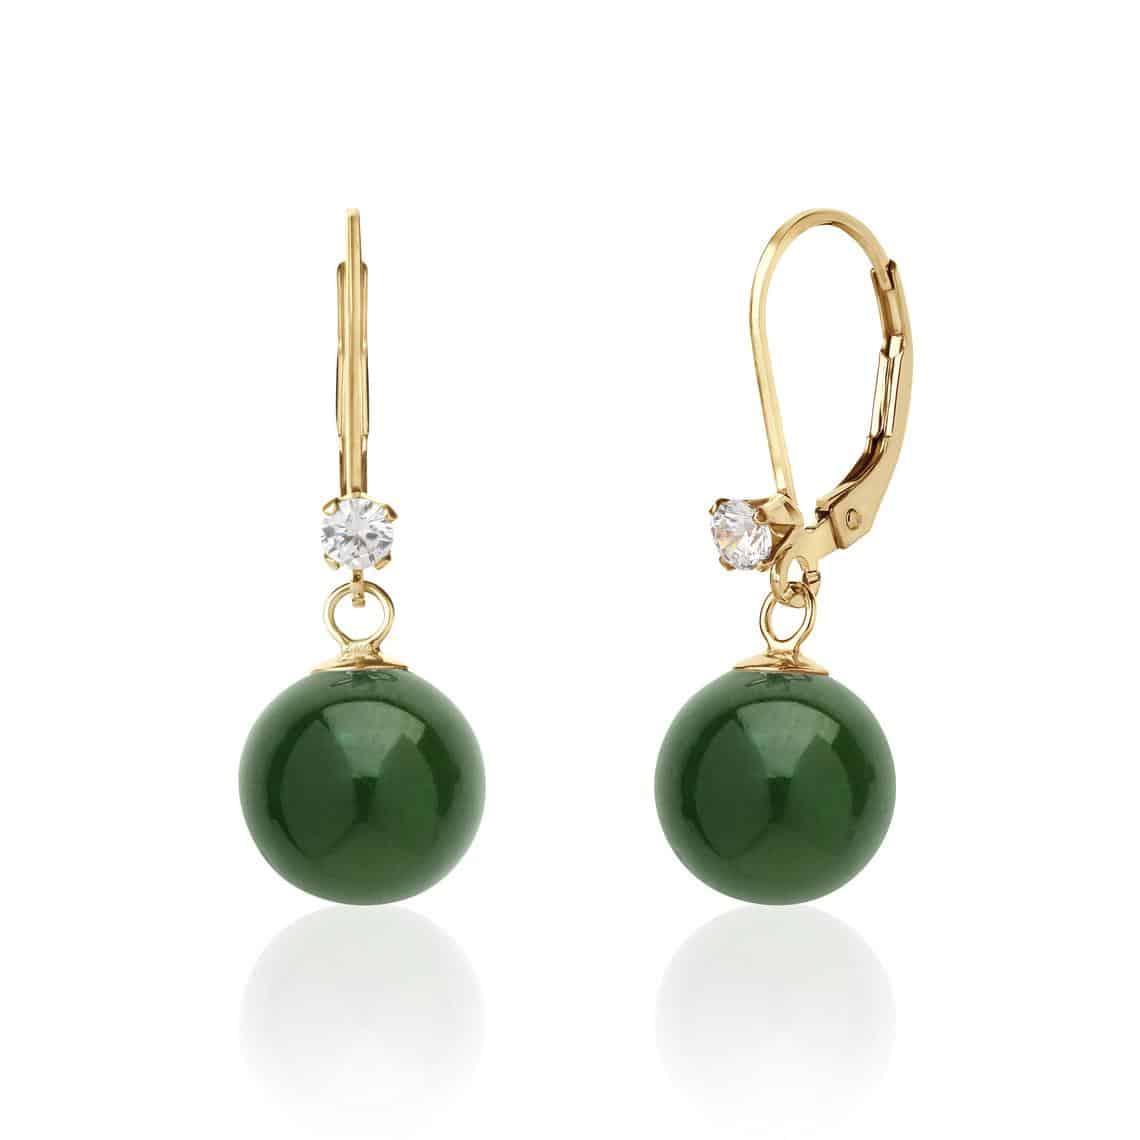 good-luck-gifts-jade-earrings